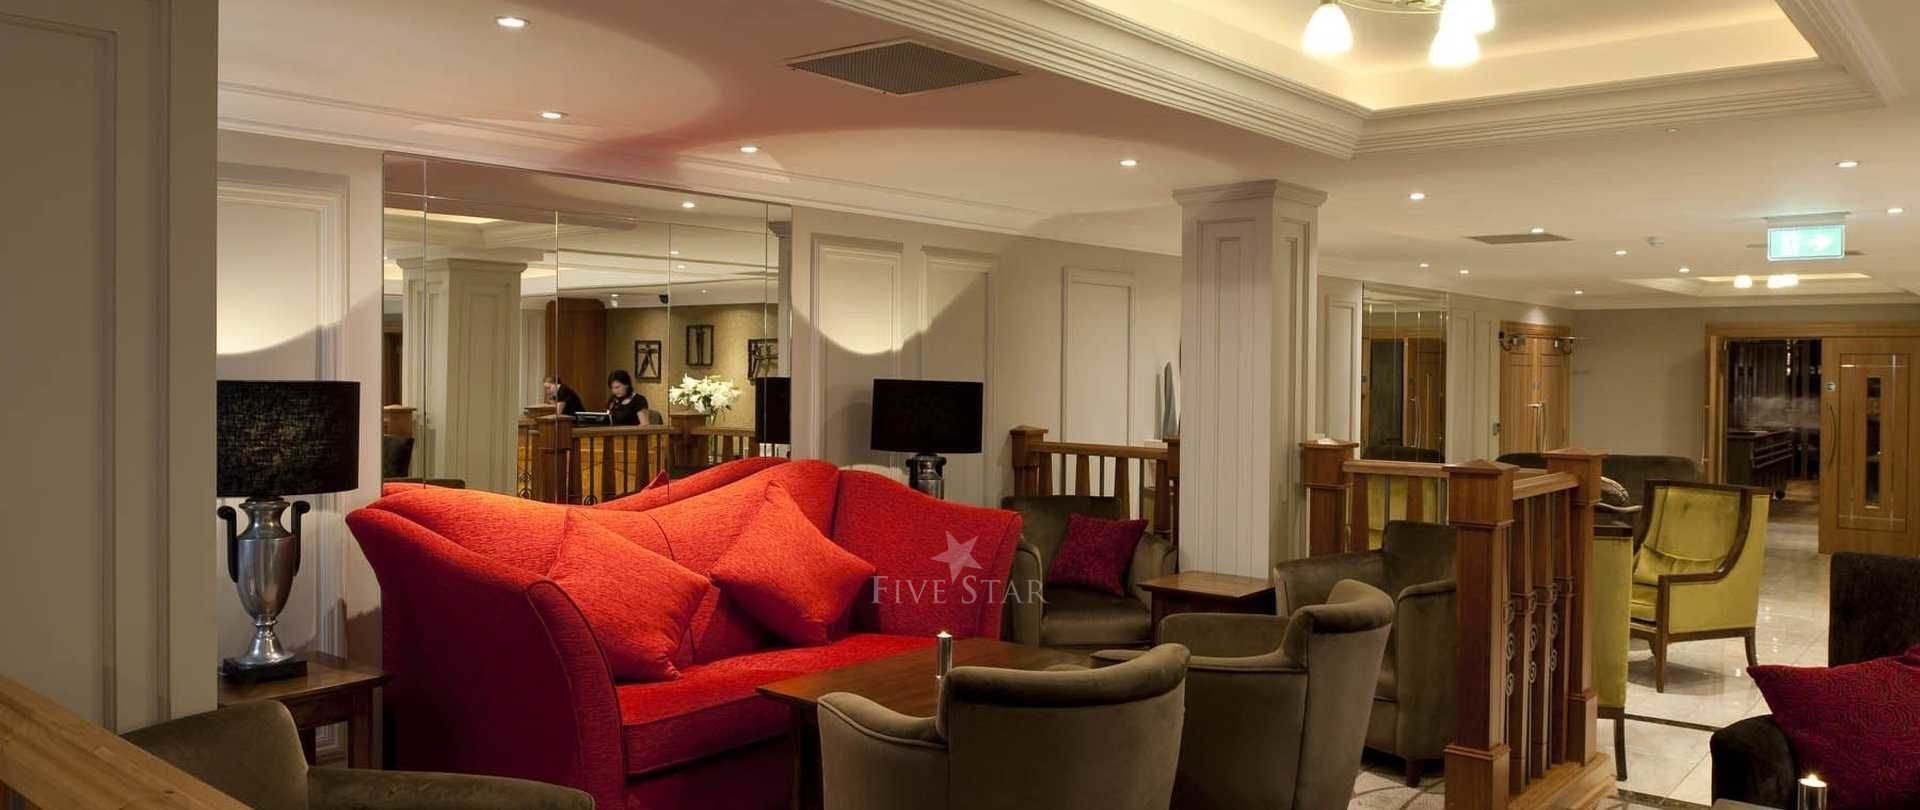 Malone Lodge Hotel & Apartments photo 3